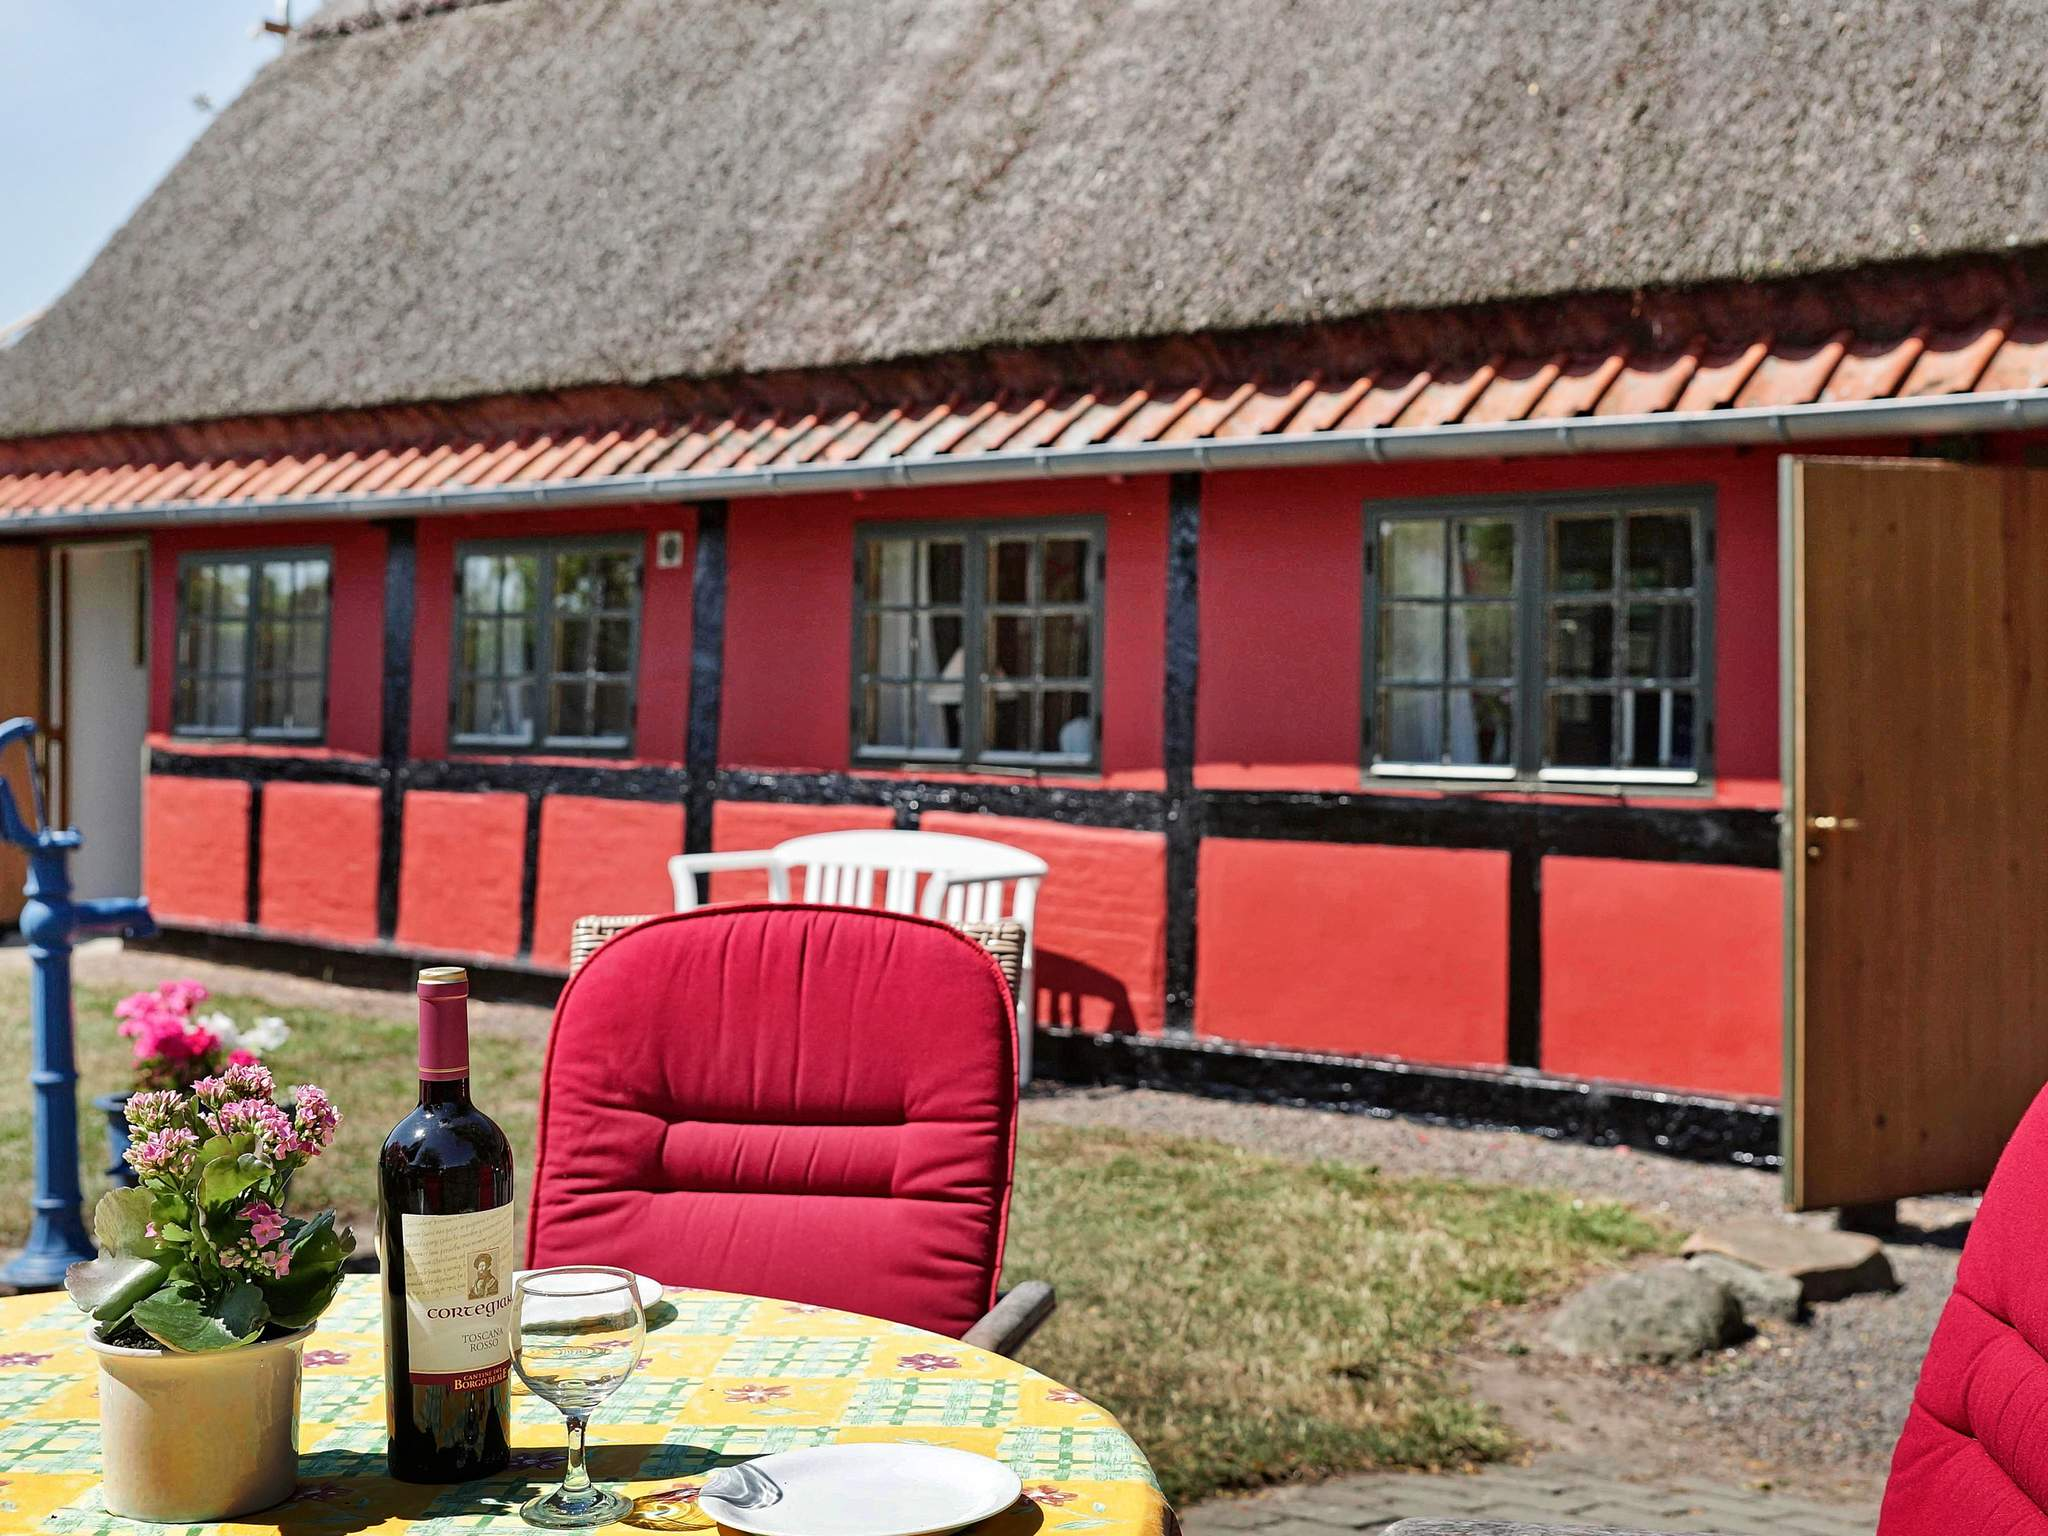 Ferienhaus Balka Strand (81872), Balke, , Bornholm, Dänemark, Bild 16